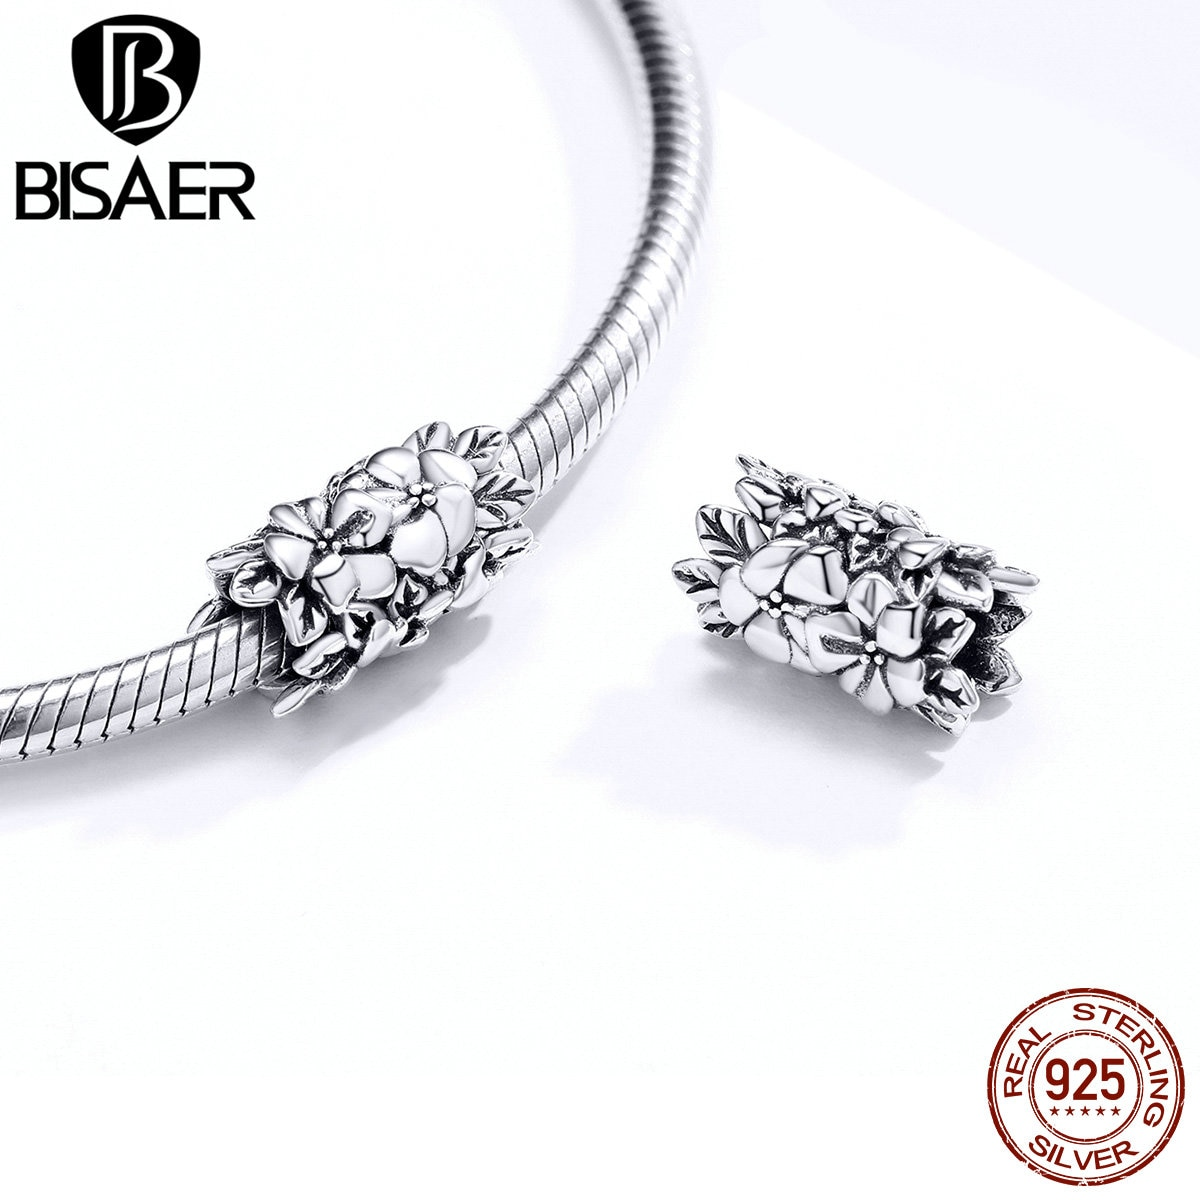 Abalorios de ramo BISAER de Plata de Ley 925, cuentas de pradera de flores silvestres para mujer, pulsera de plata 925, joyería de regalo HSC1488